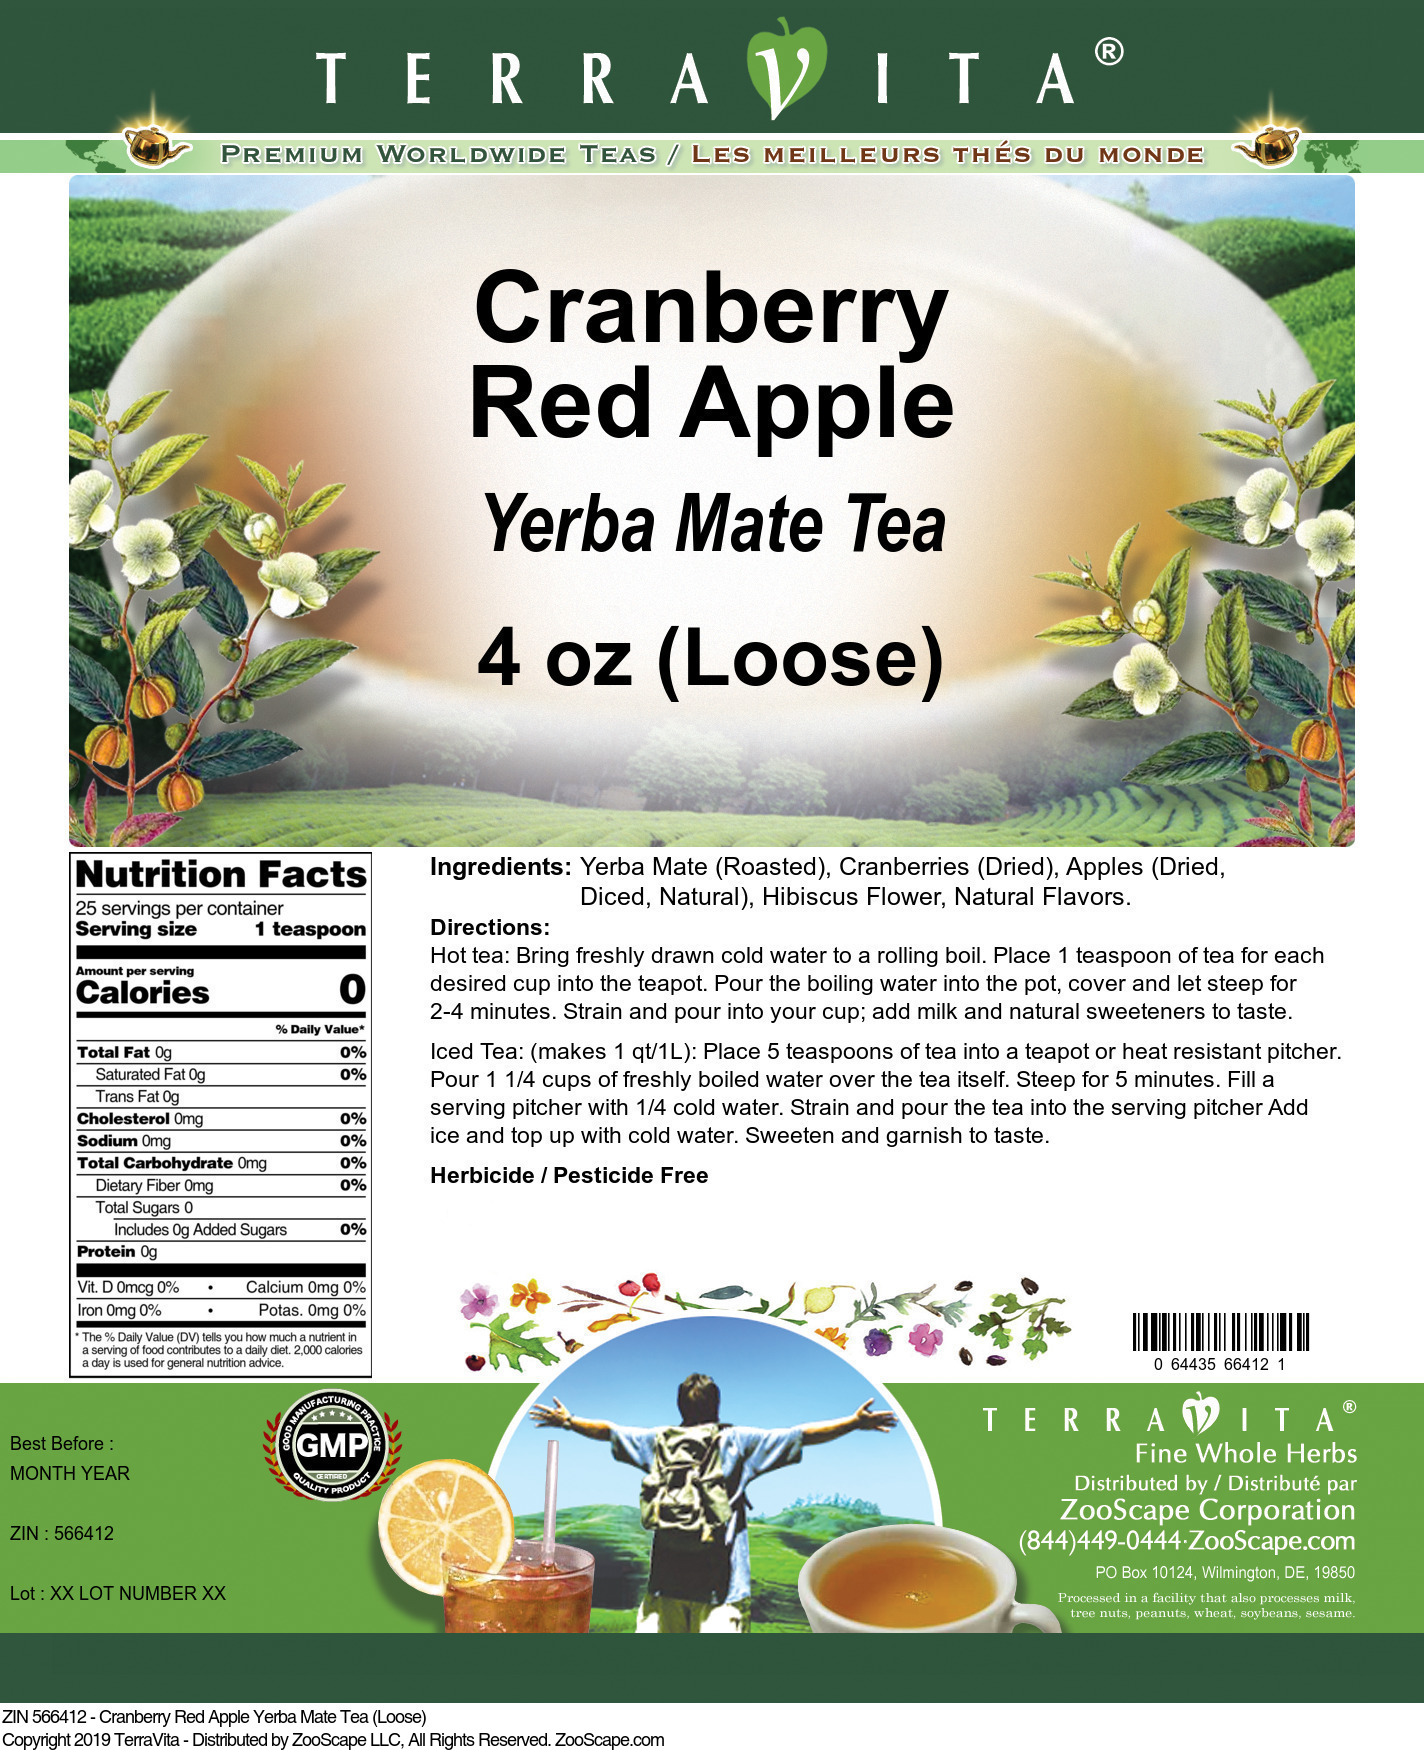 Cranberry Red Apple Yerba Mate